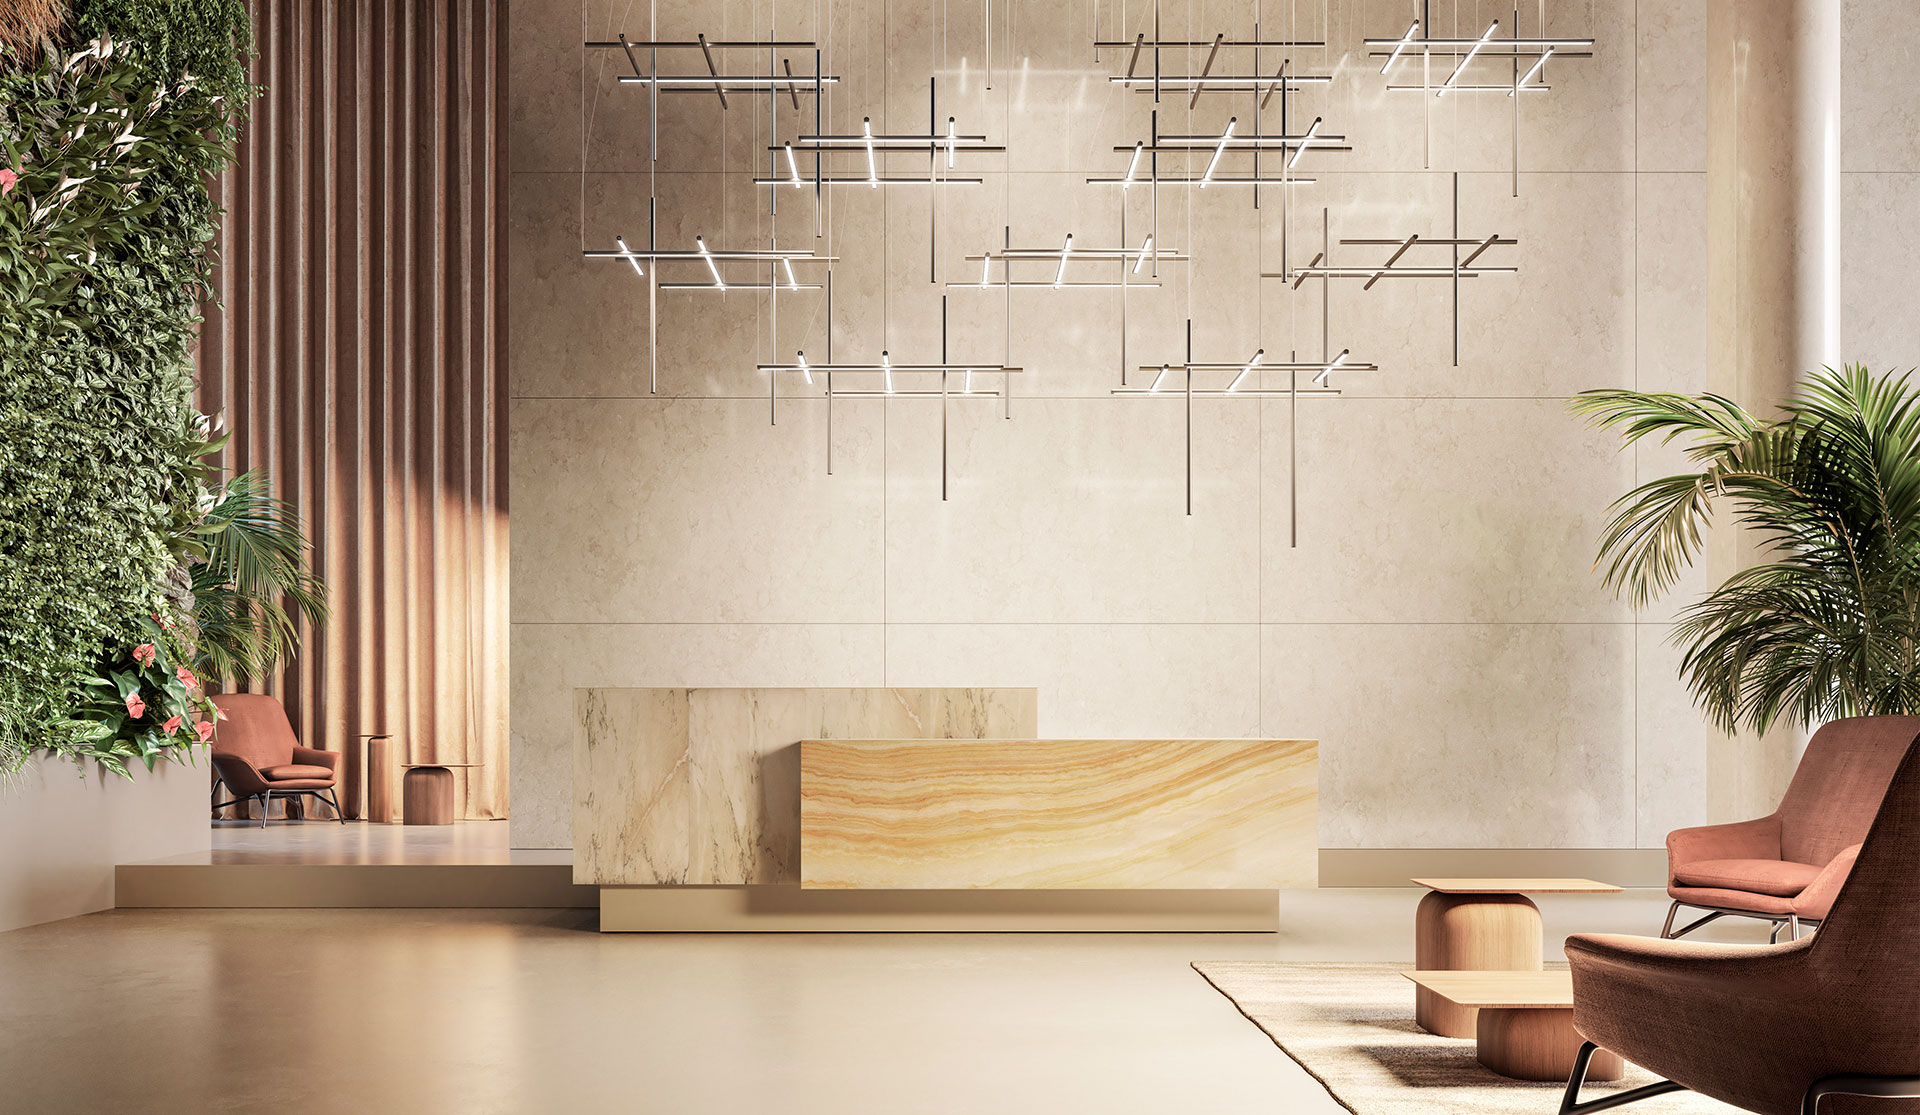 Matteo Thun & Partners